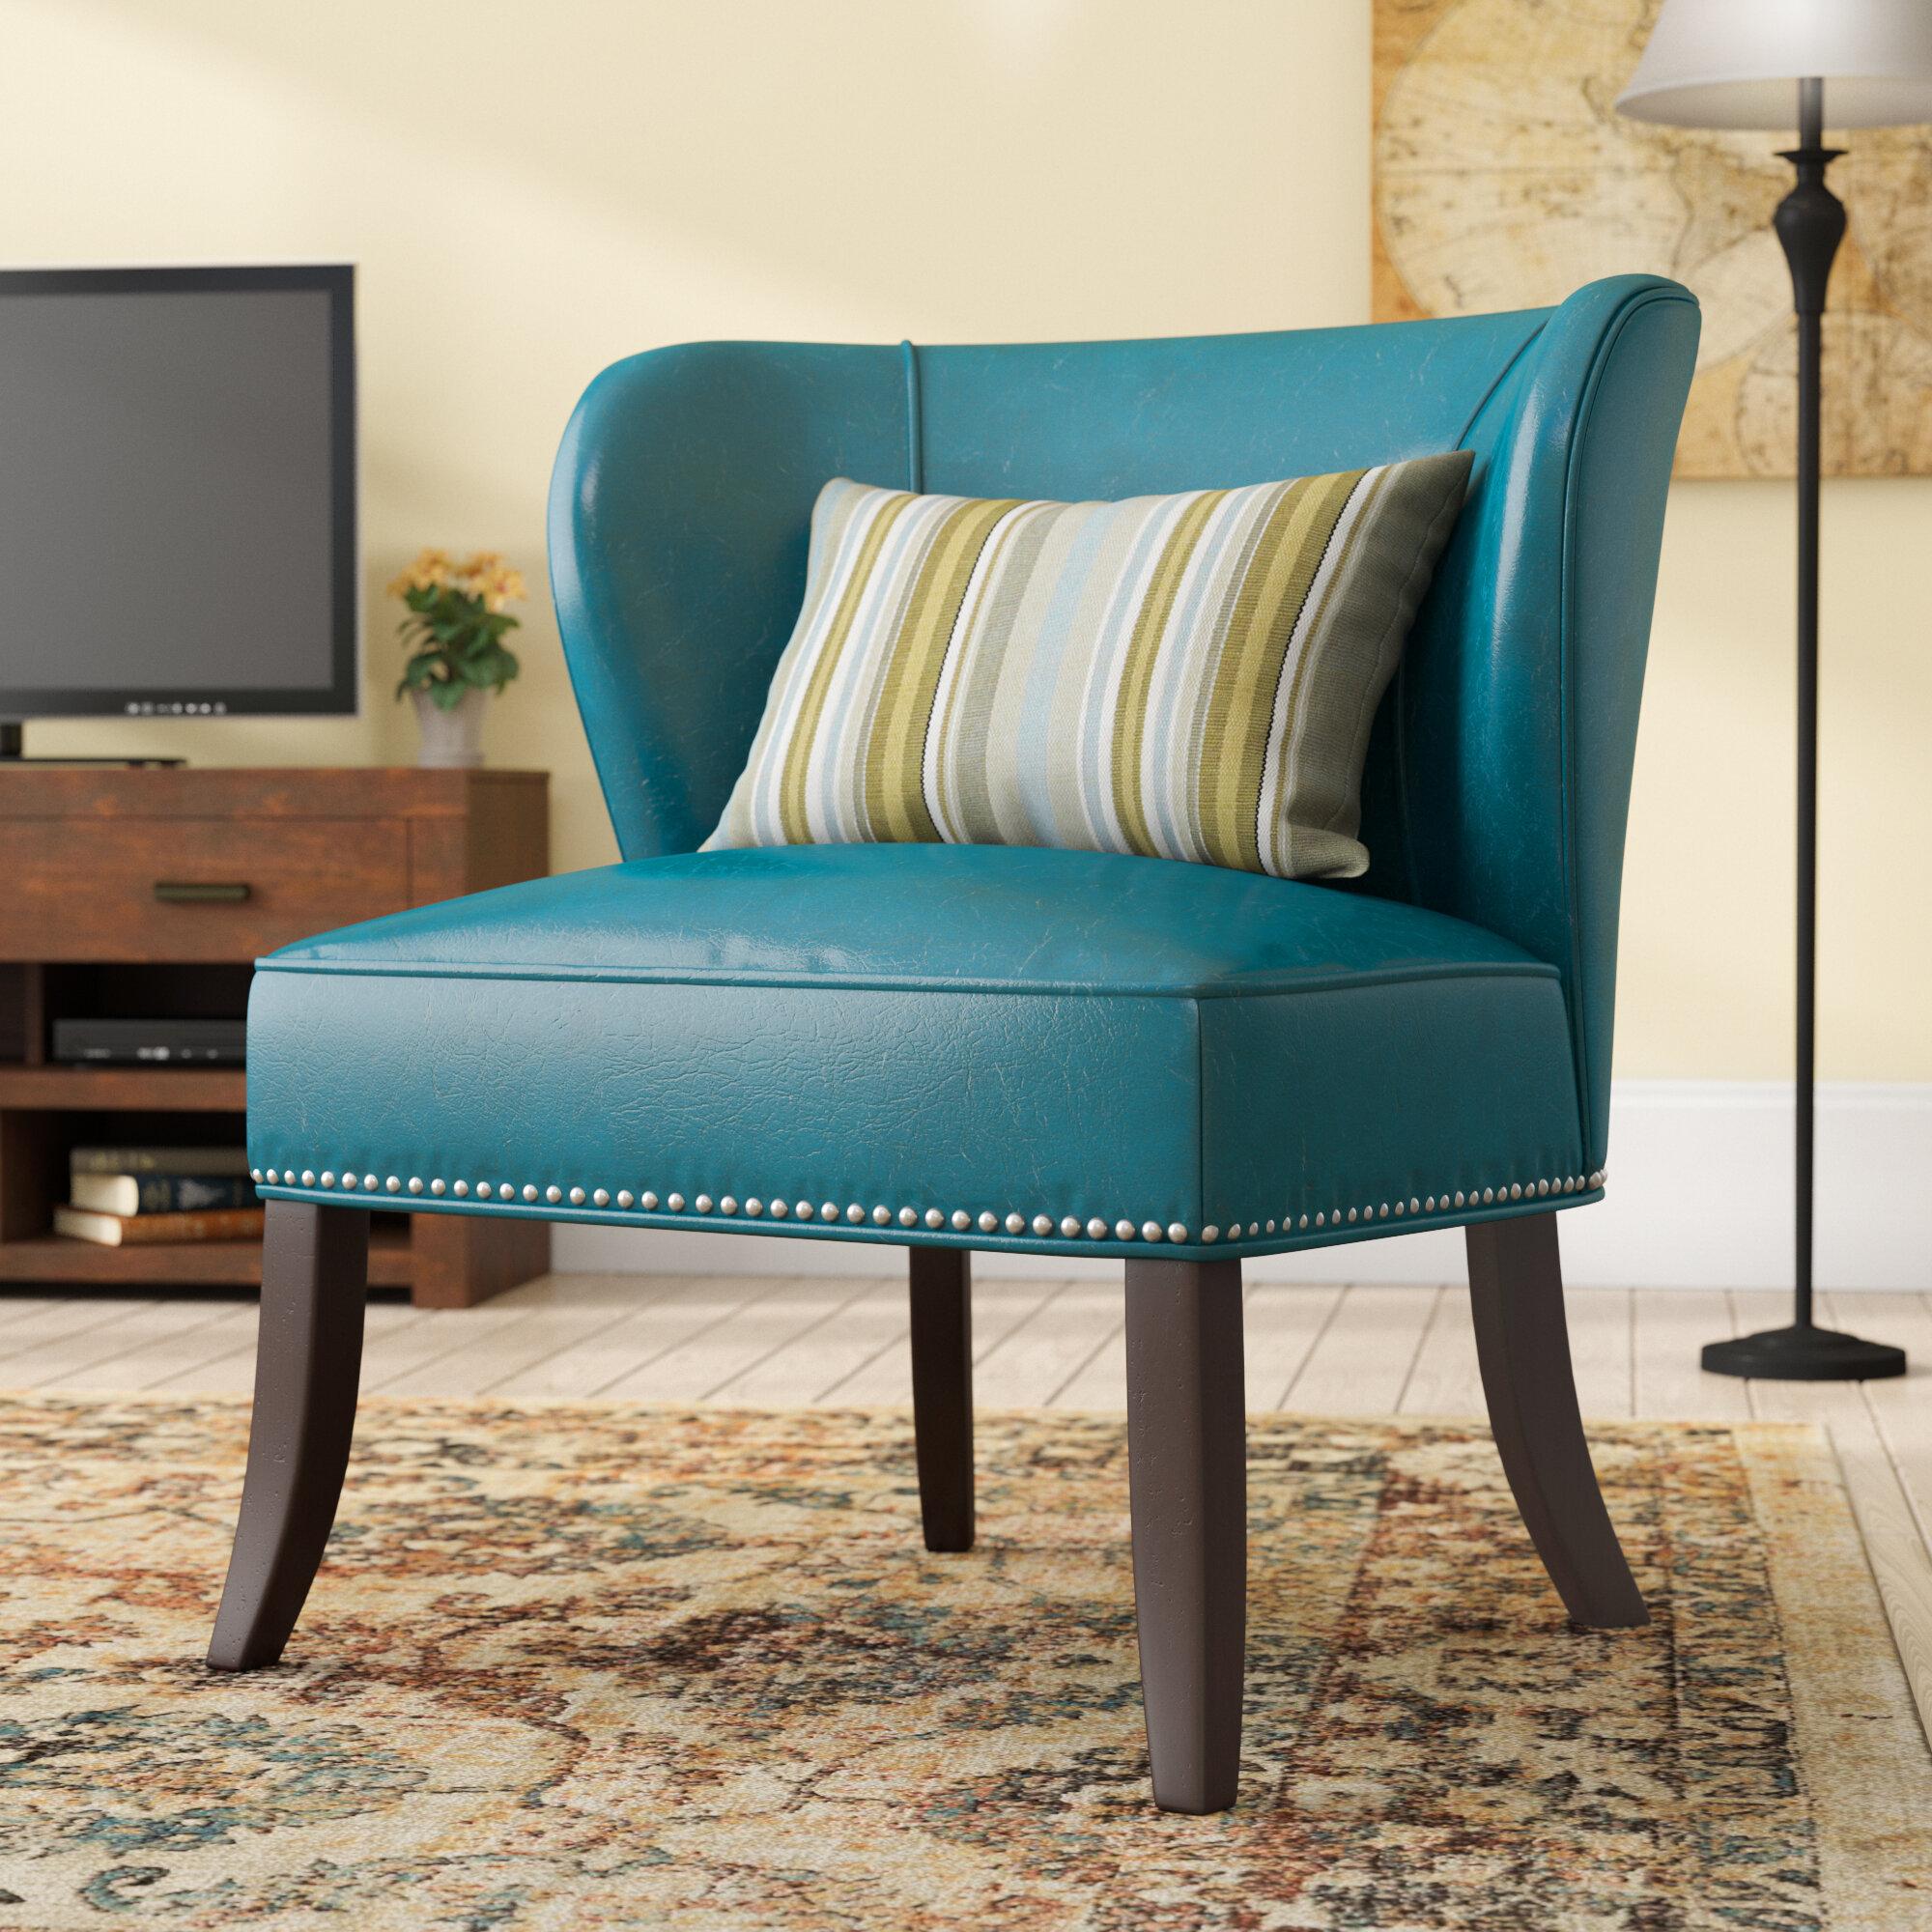 Slipper Chairs | Wayfair With Regard To Wadhurst Slipper Chairs (View 11 of 15)